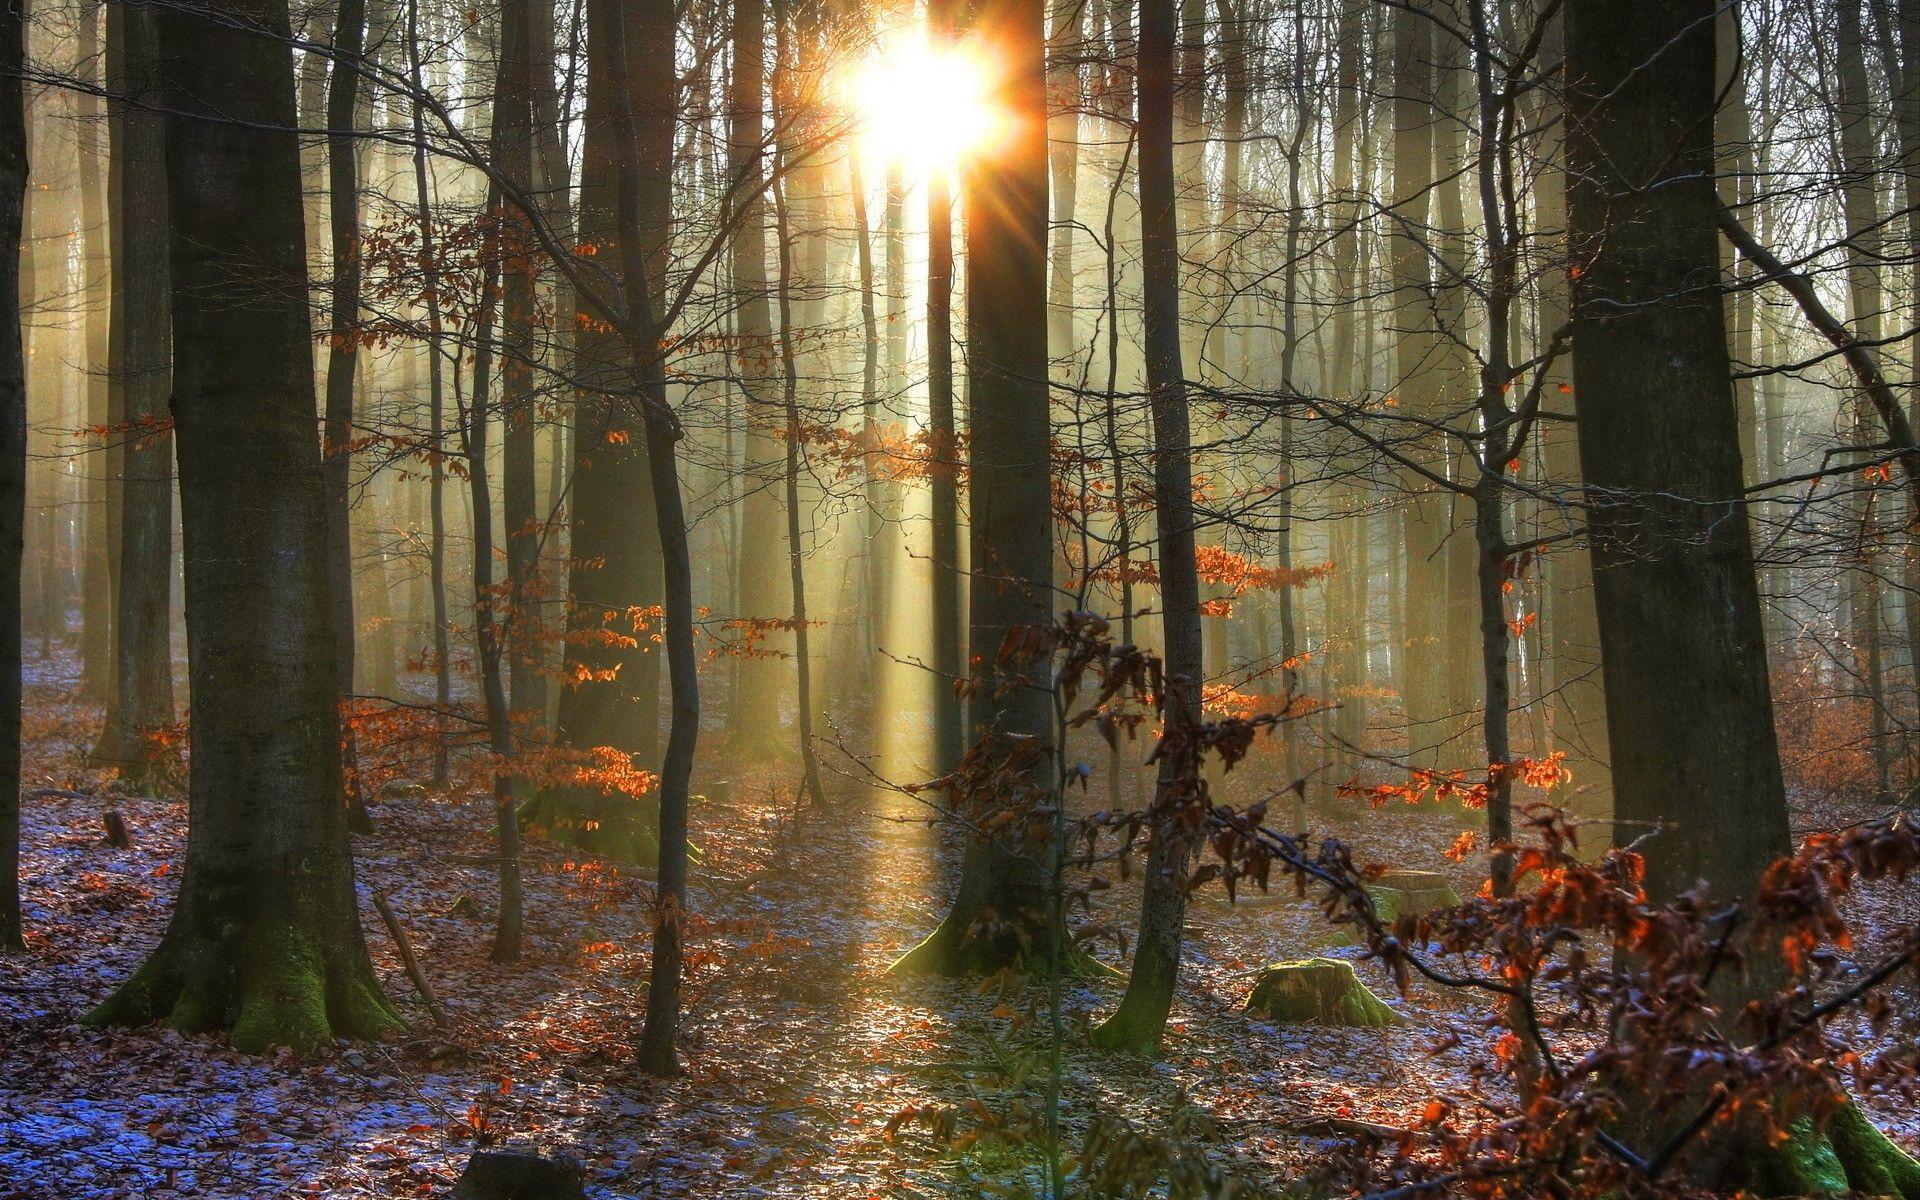 Landscapes Forest Woods Trunks Sunlight Sunrise Sunset Beam Rays Tree Forest Landscape Tree